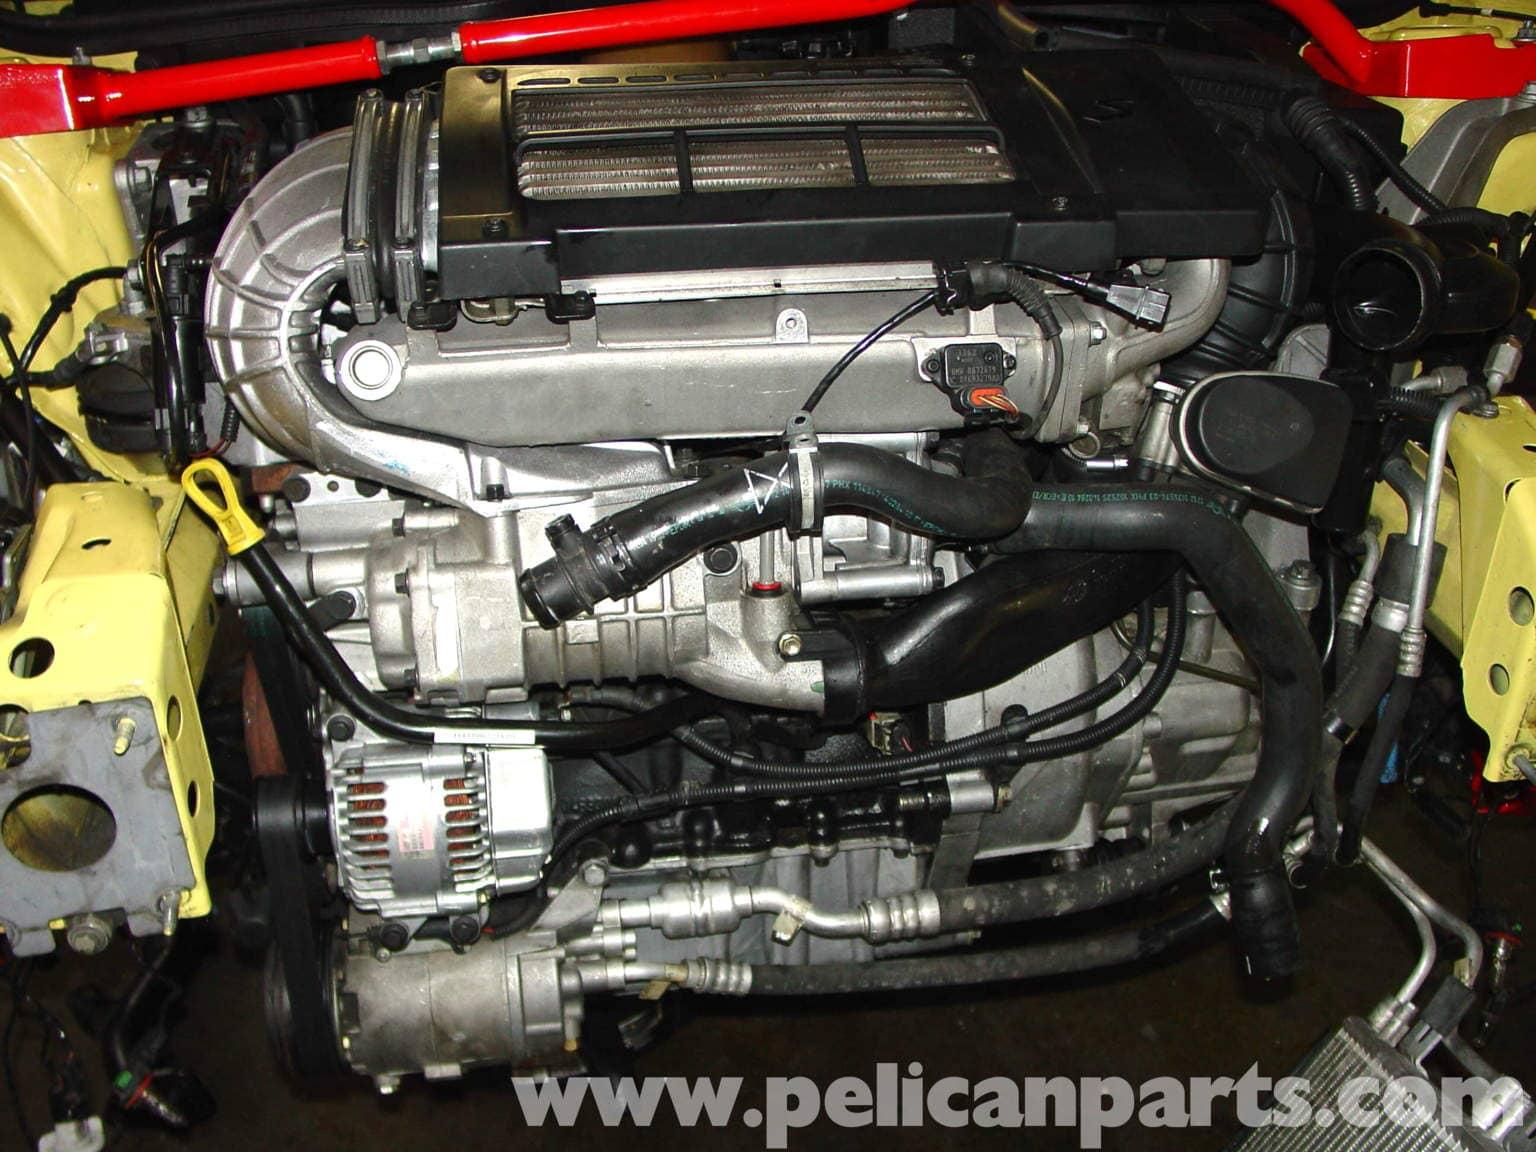 MINI Cooper Radiator Thermostat And Hose Replacement RRR - 03 mini cooper s wiring diagram